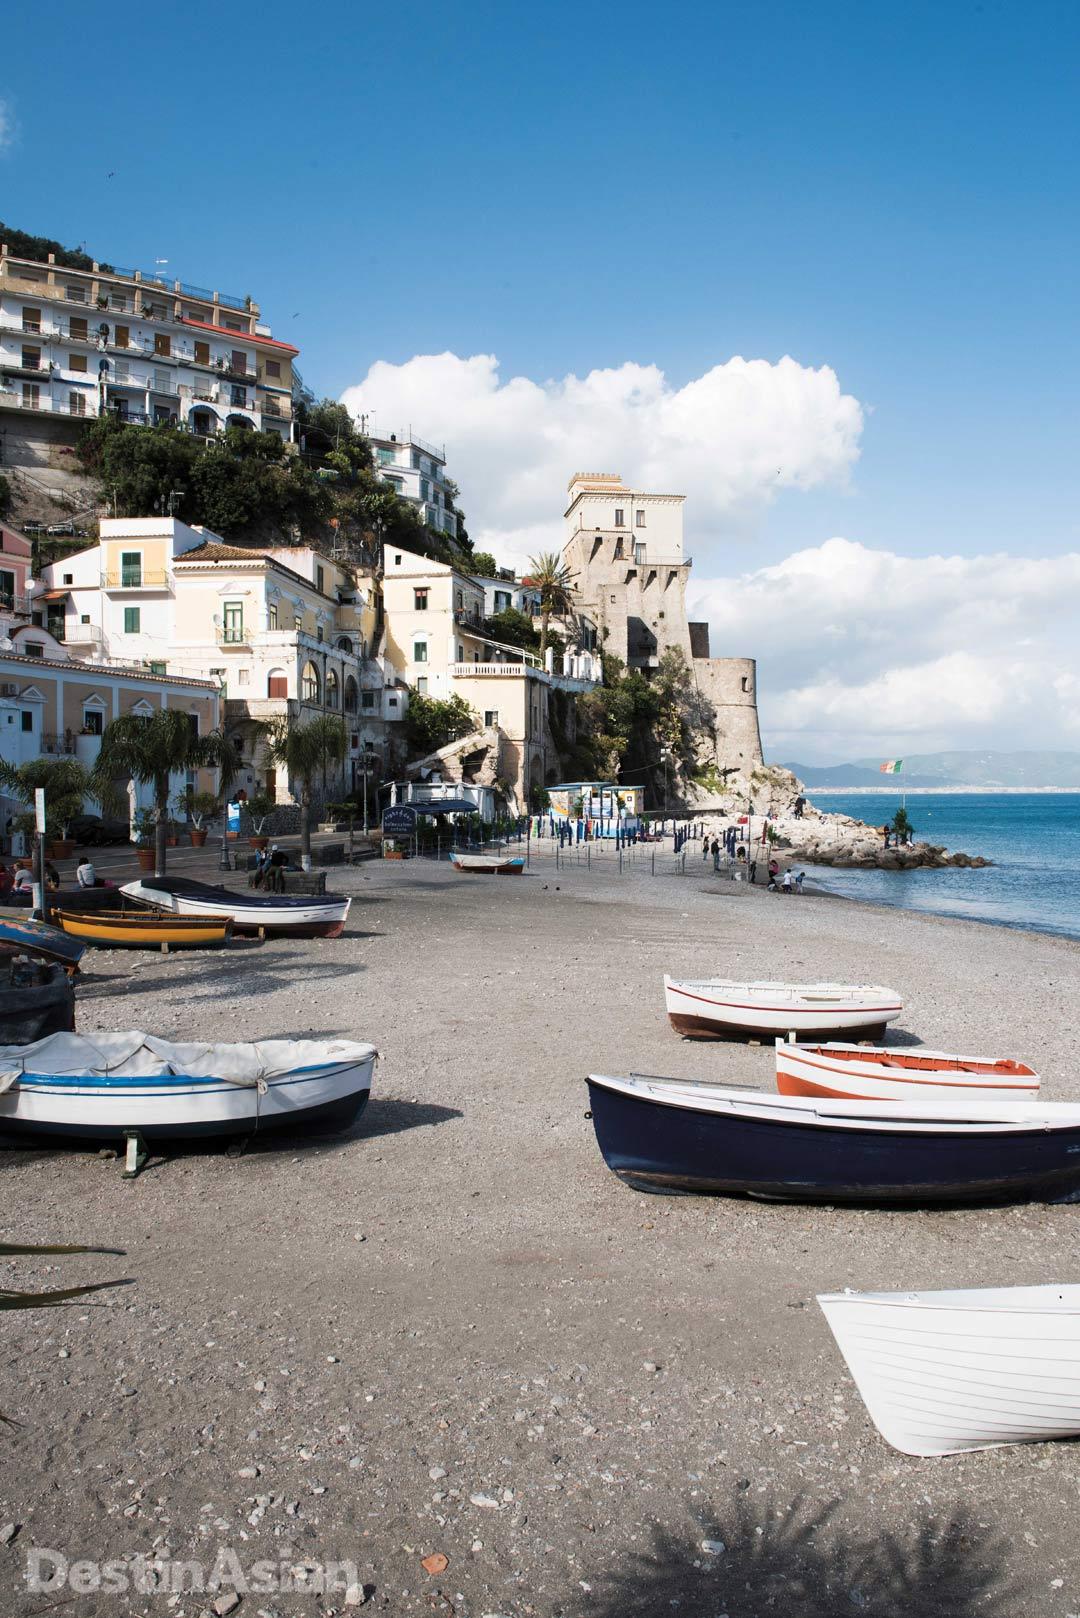 The main beach at Cetara, a fishing town on the Amalfi Coast.